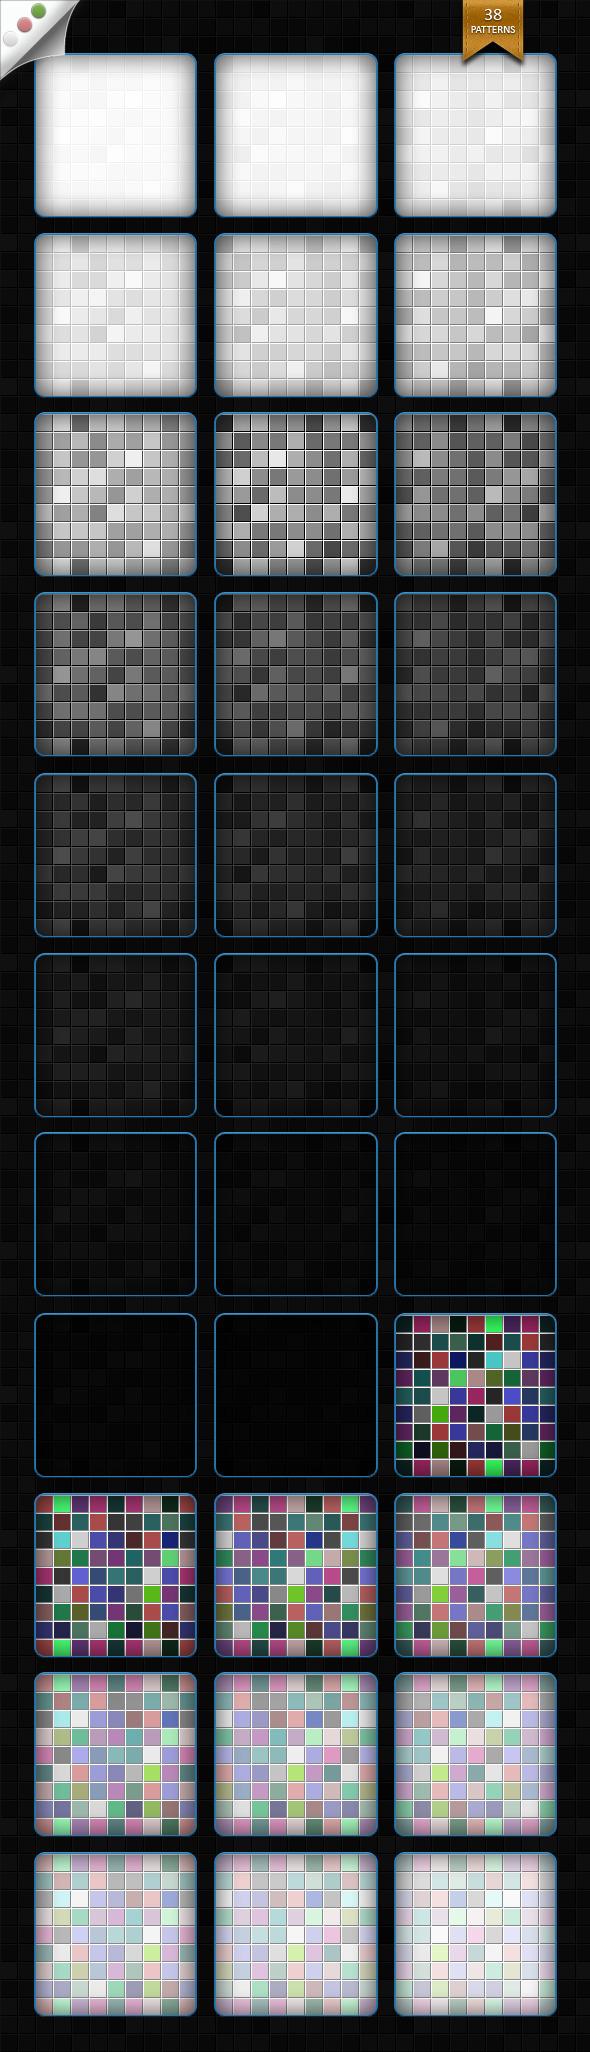 Mozaic Patterns - Textures / Fills / Patterns Photoshop